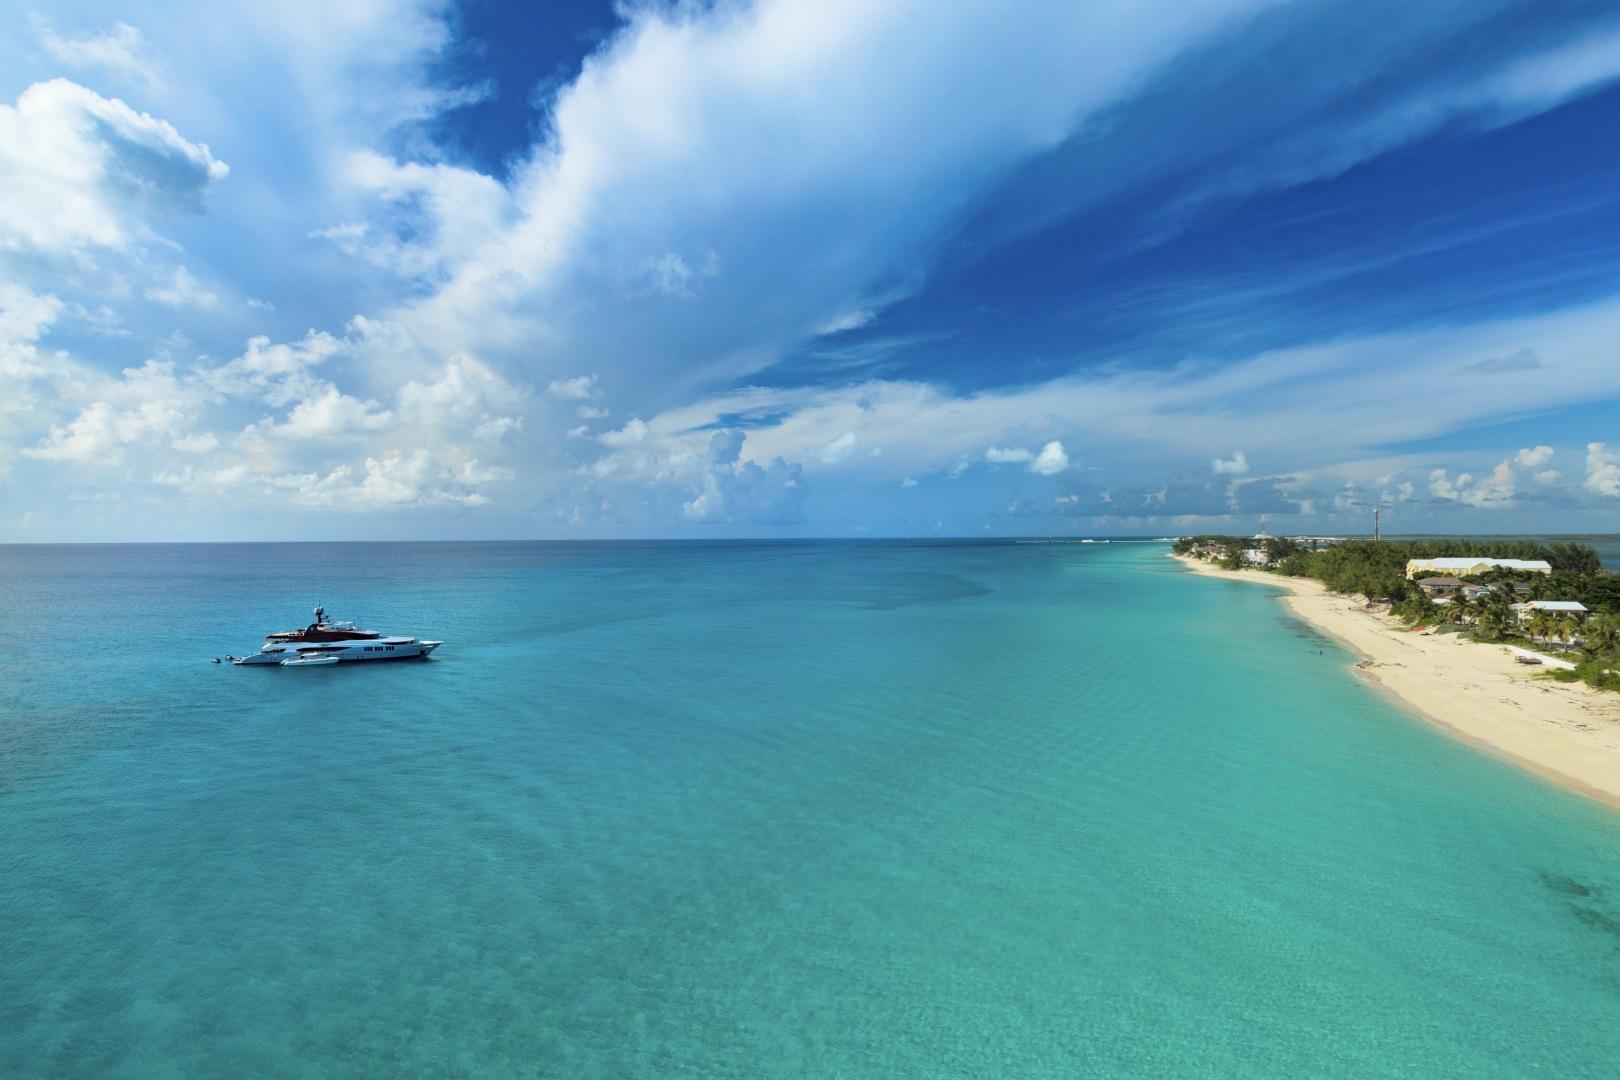 Trinity Yachts-164 Tri-deck Motor Yacht 2008-Amarula Sun Fort Lauderdale-Florida-United States-Aerial View-1513902 | Thumbnail